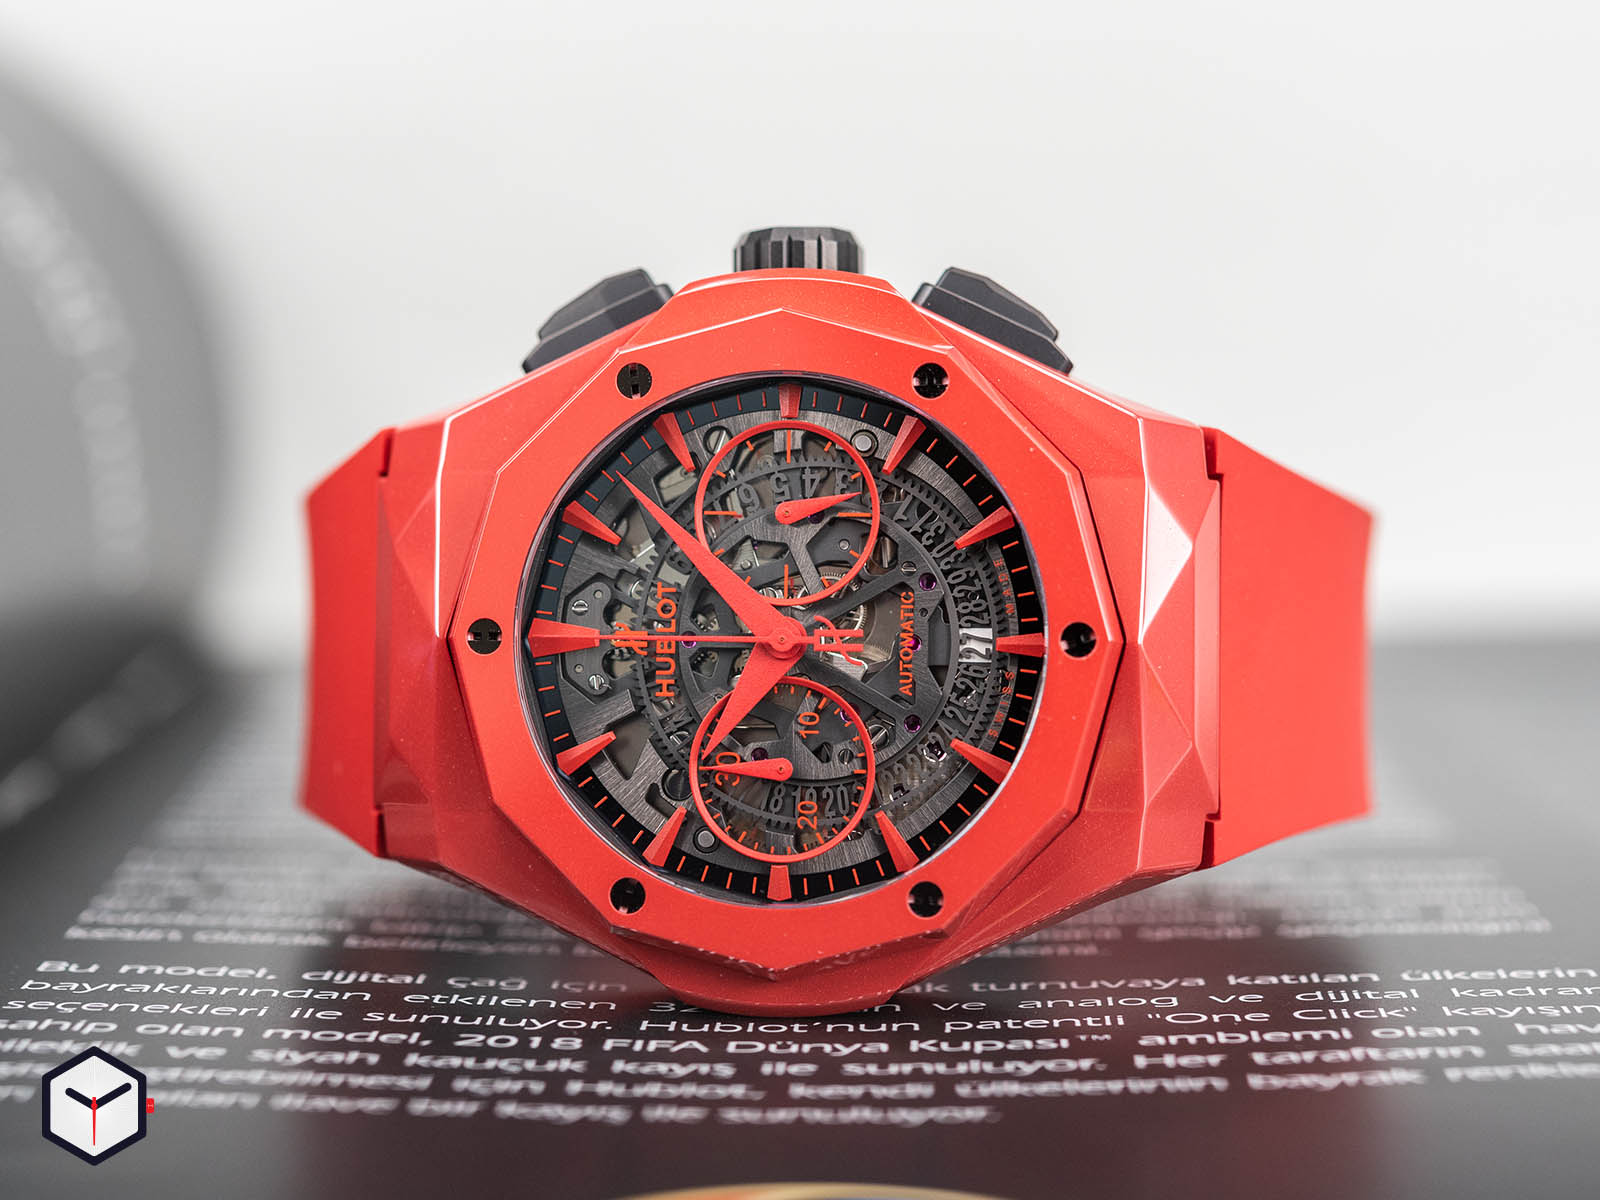 525-cf-0130-rx-orl19-hublot-classic-fusion-chronograph-orlinski-red-ceramic-1.jpg